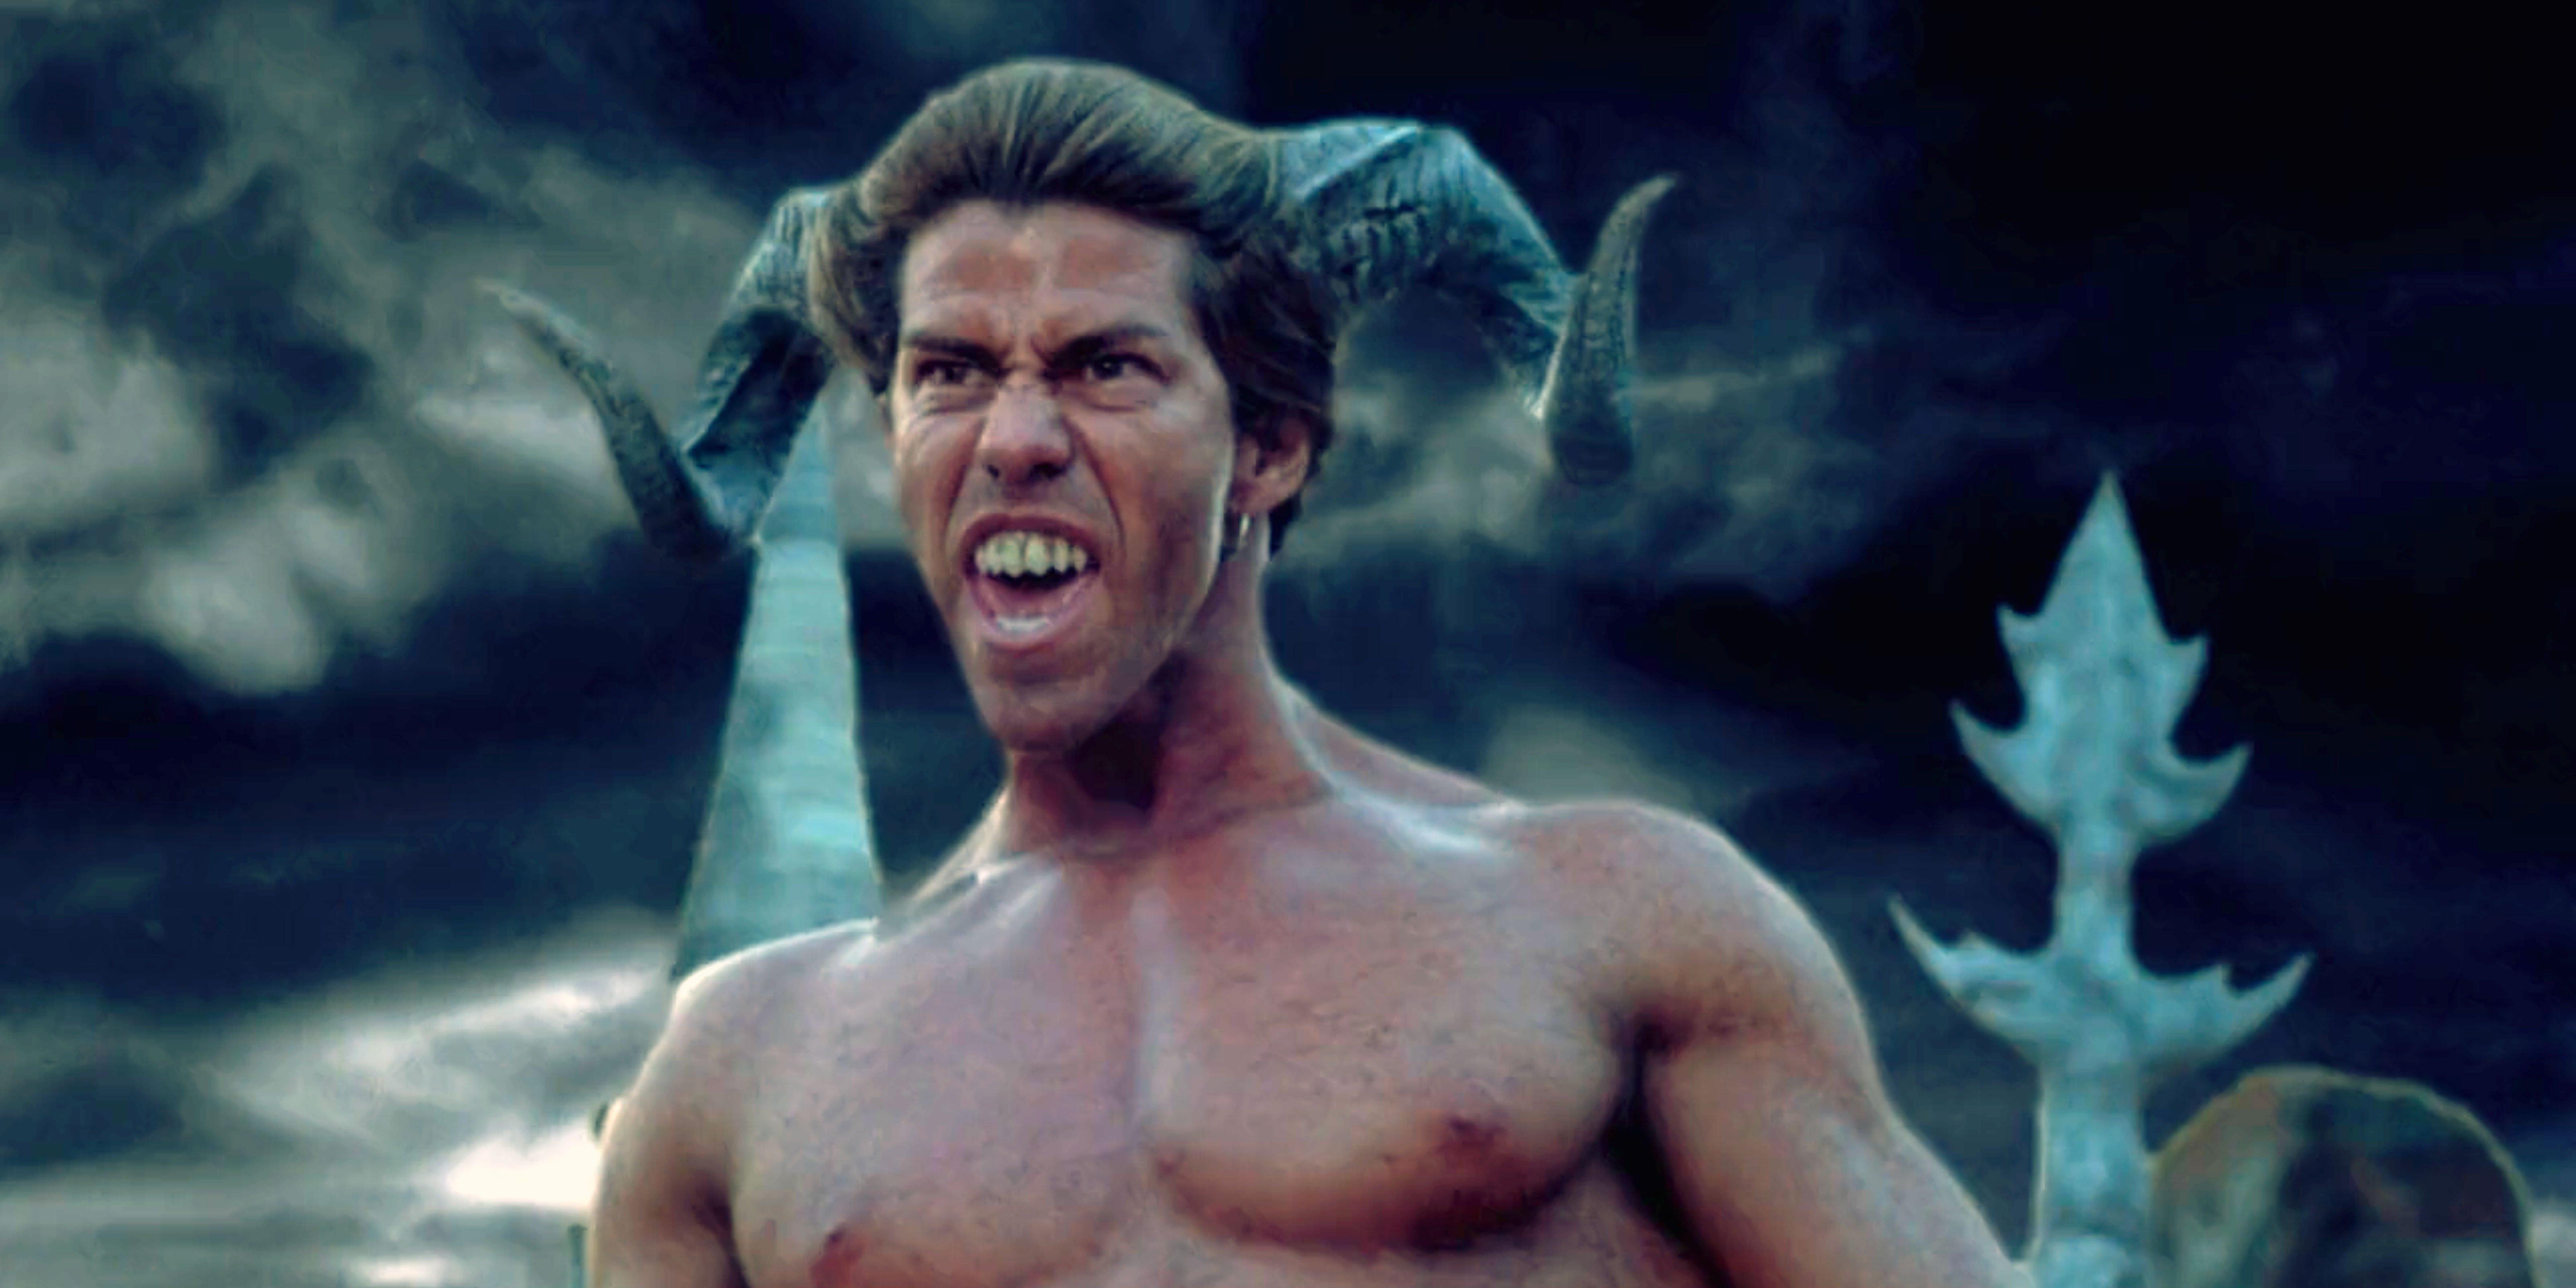 Motaro squares off for battle in Mortal Kombat: Annihilation